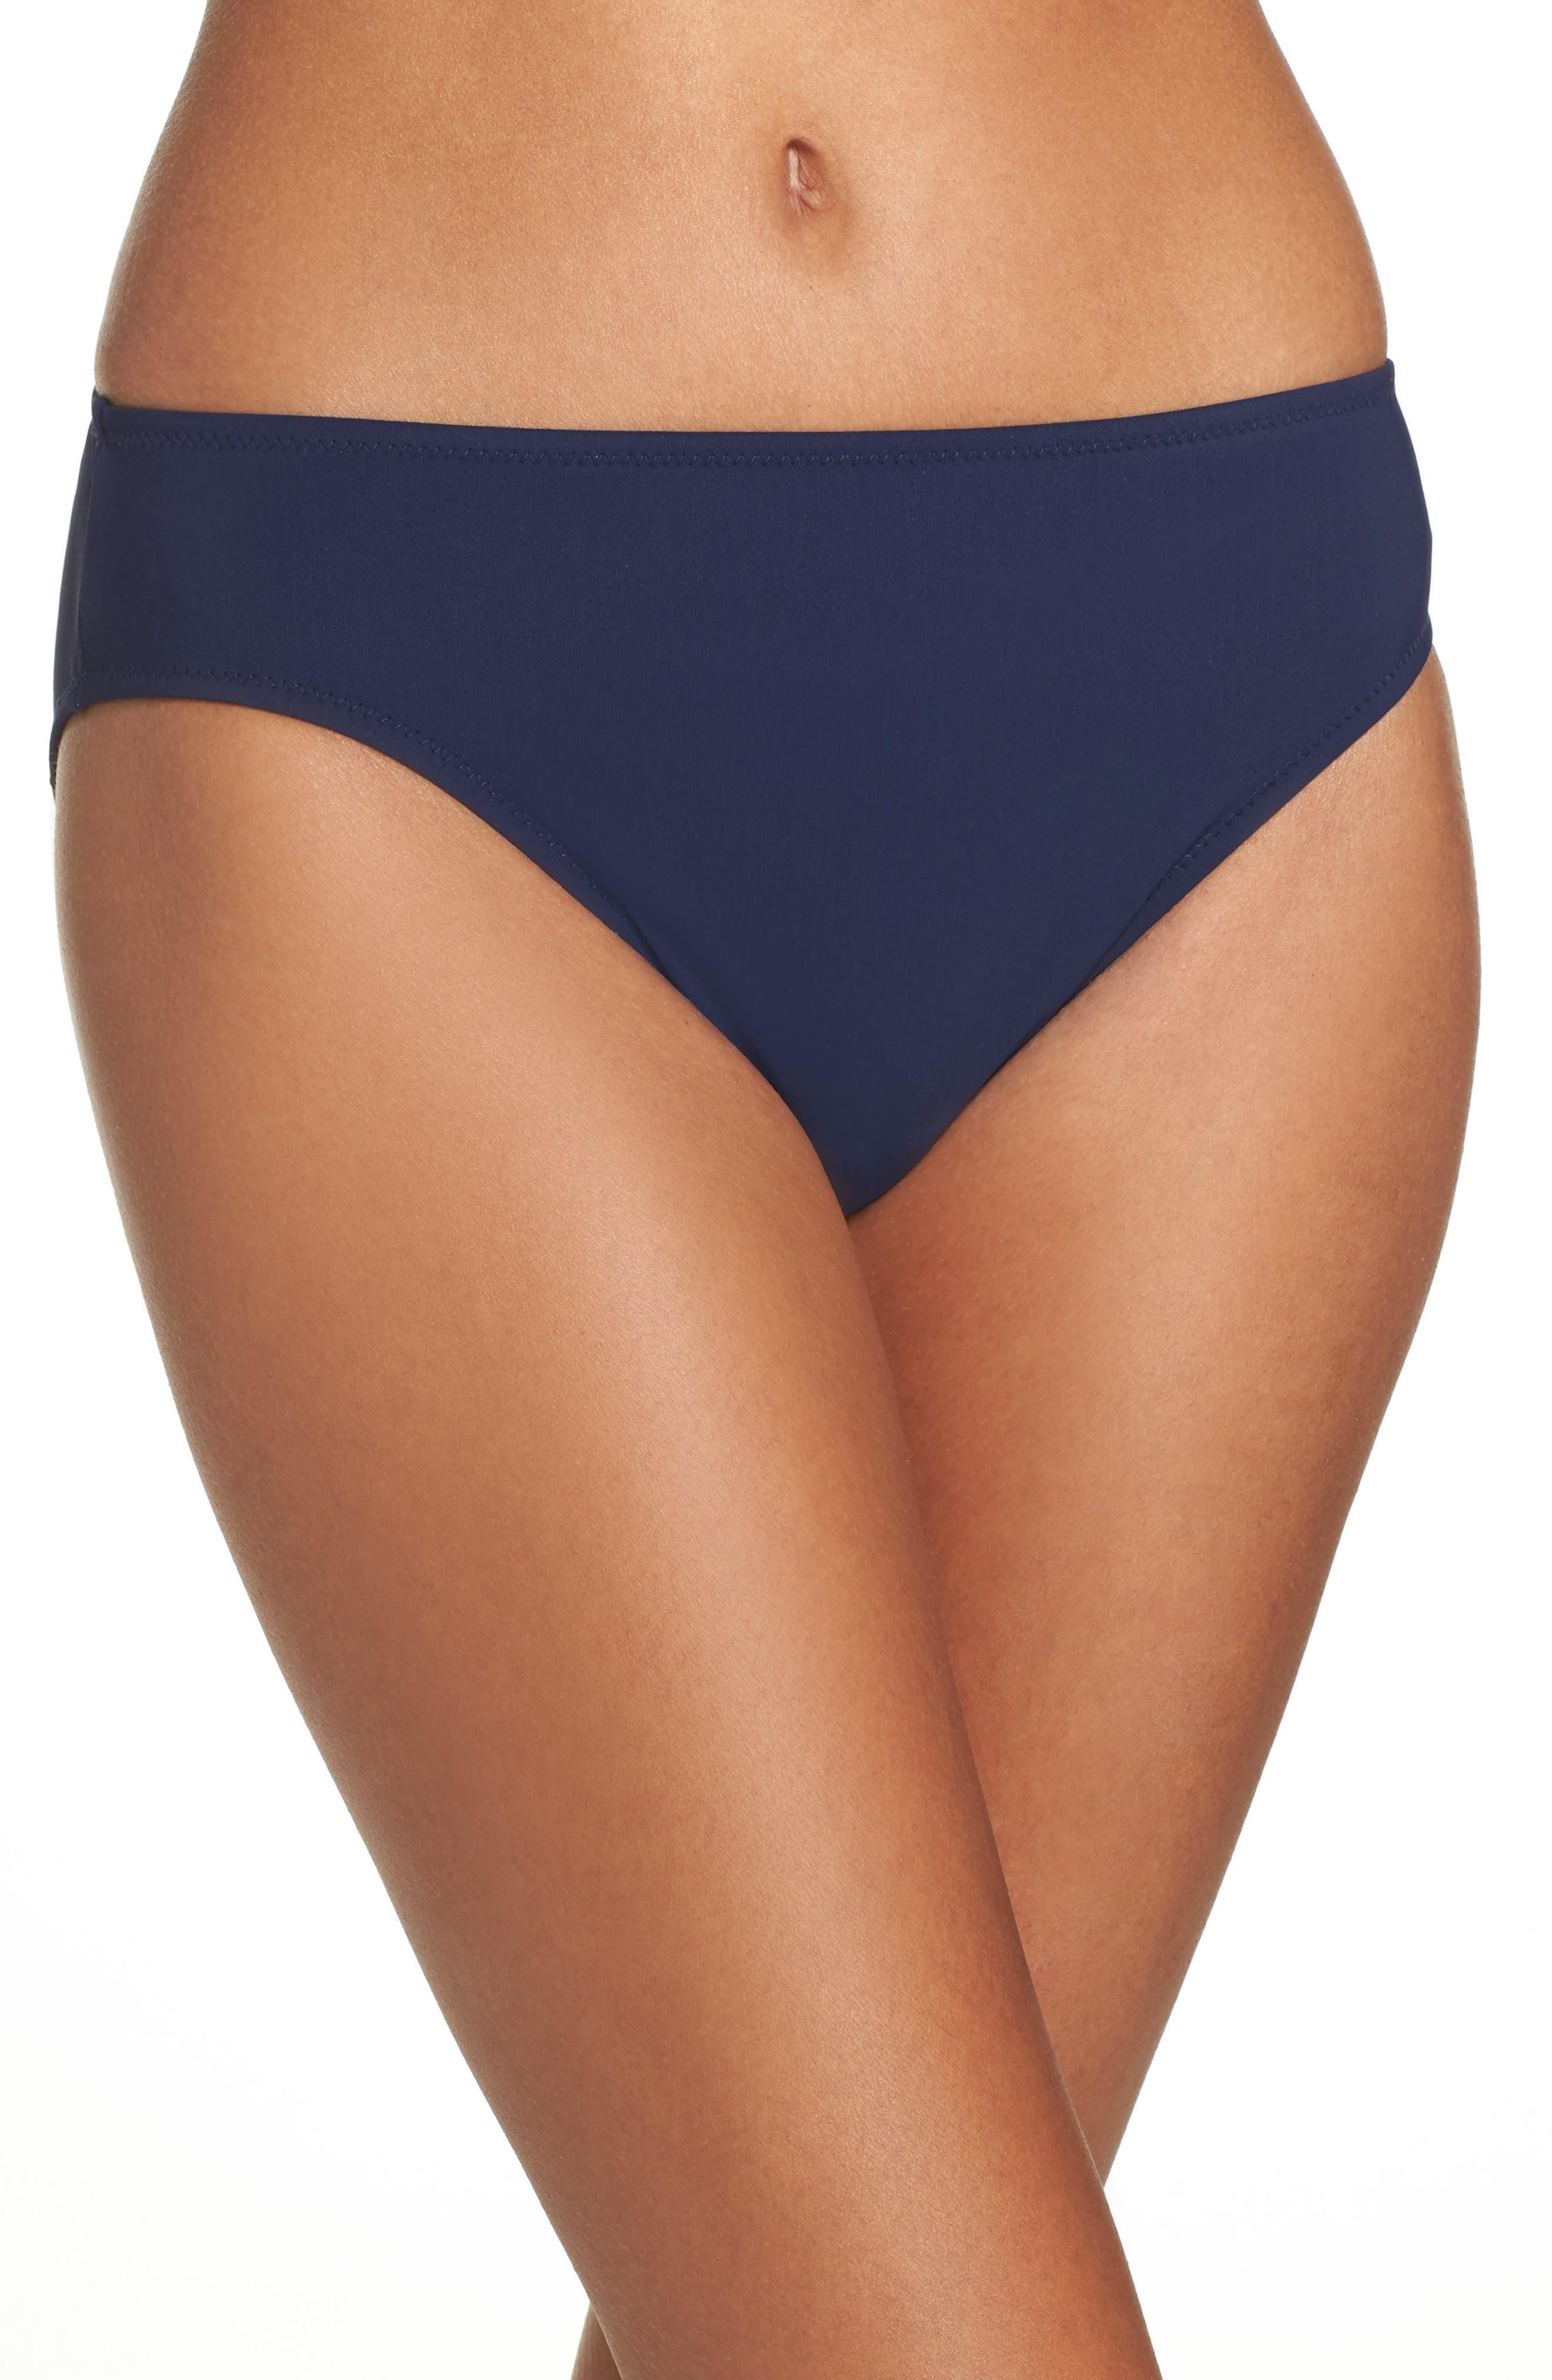 PROFILE BY GOTTEX Hipster Bikini Bottoms